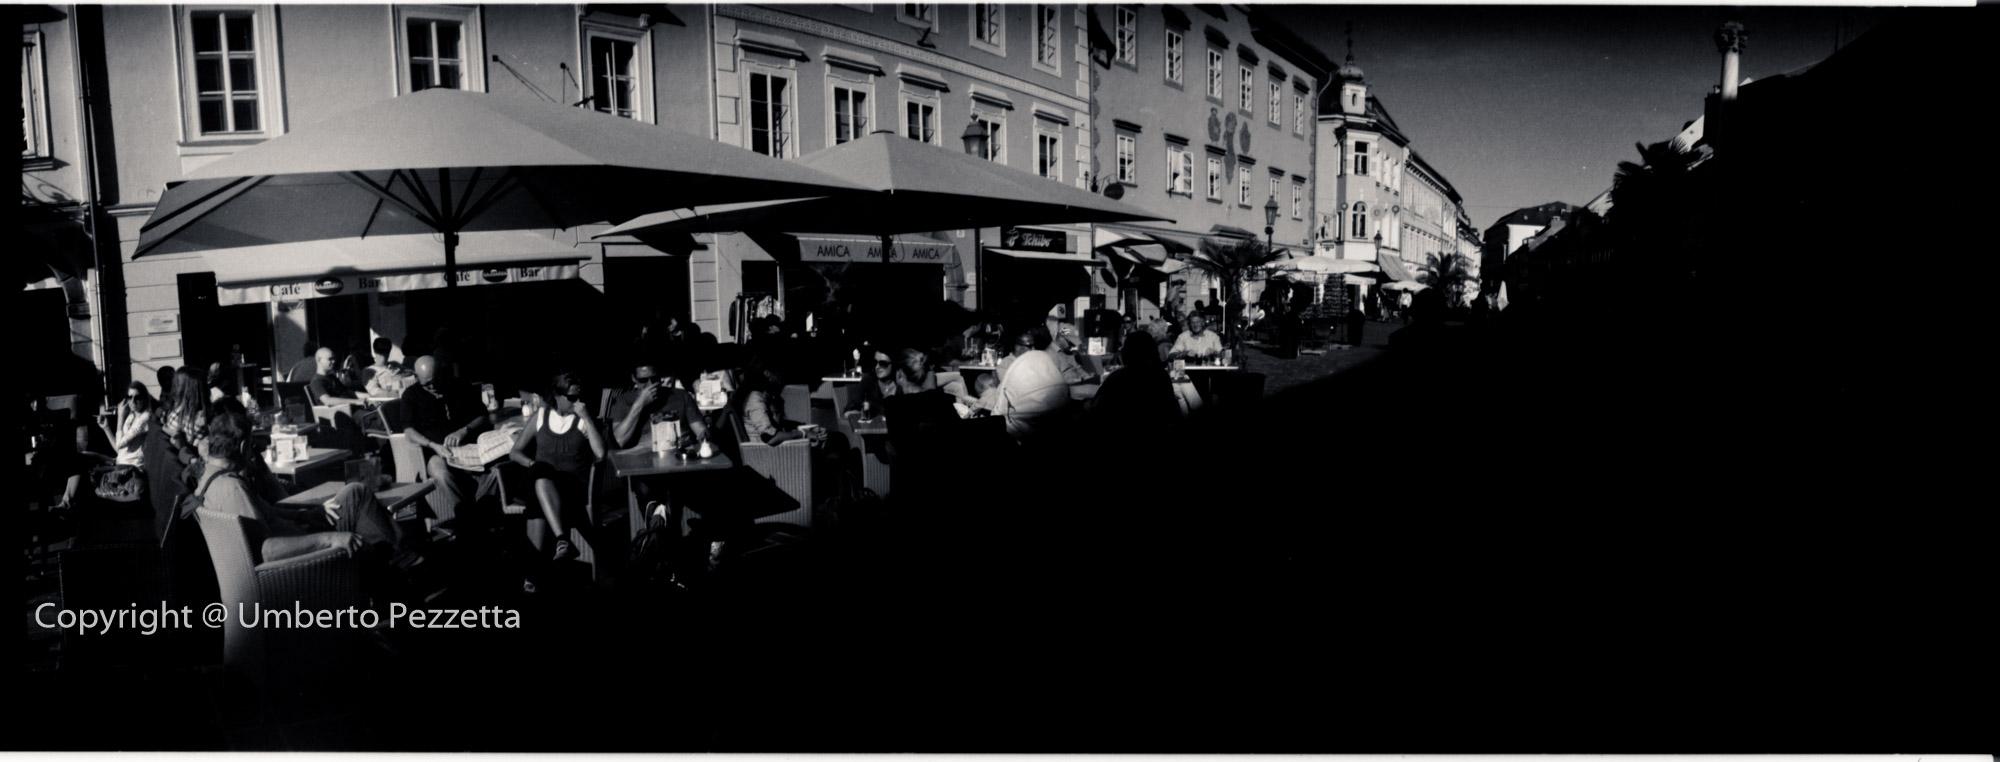 Klagenfurt - Austria (11)